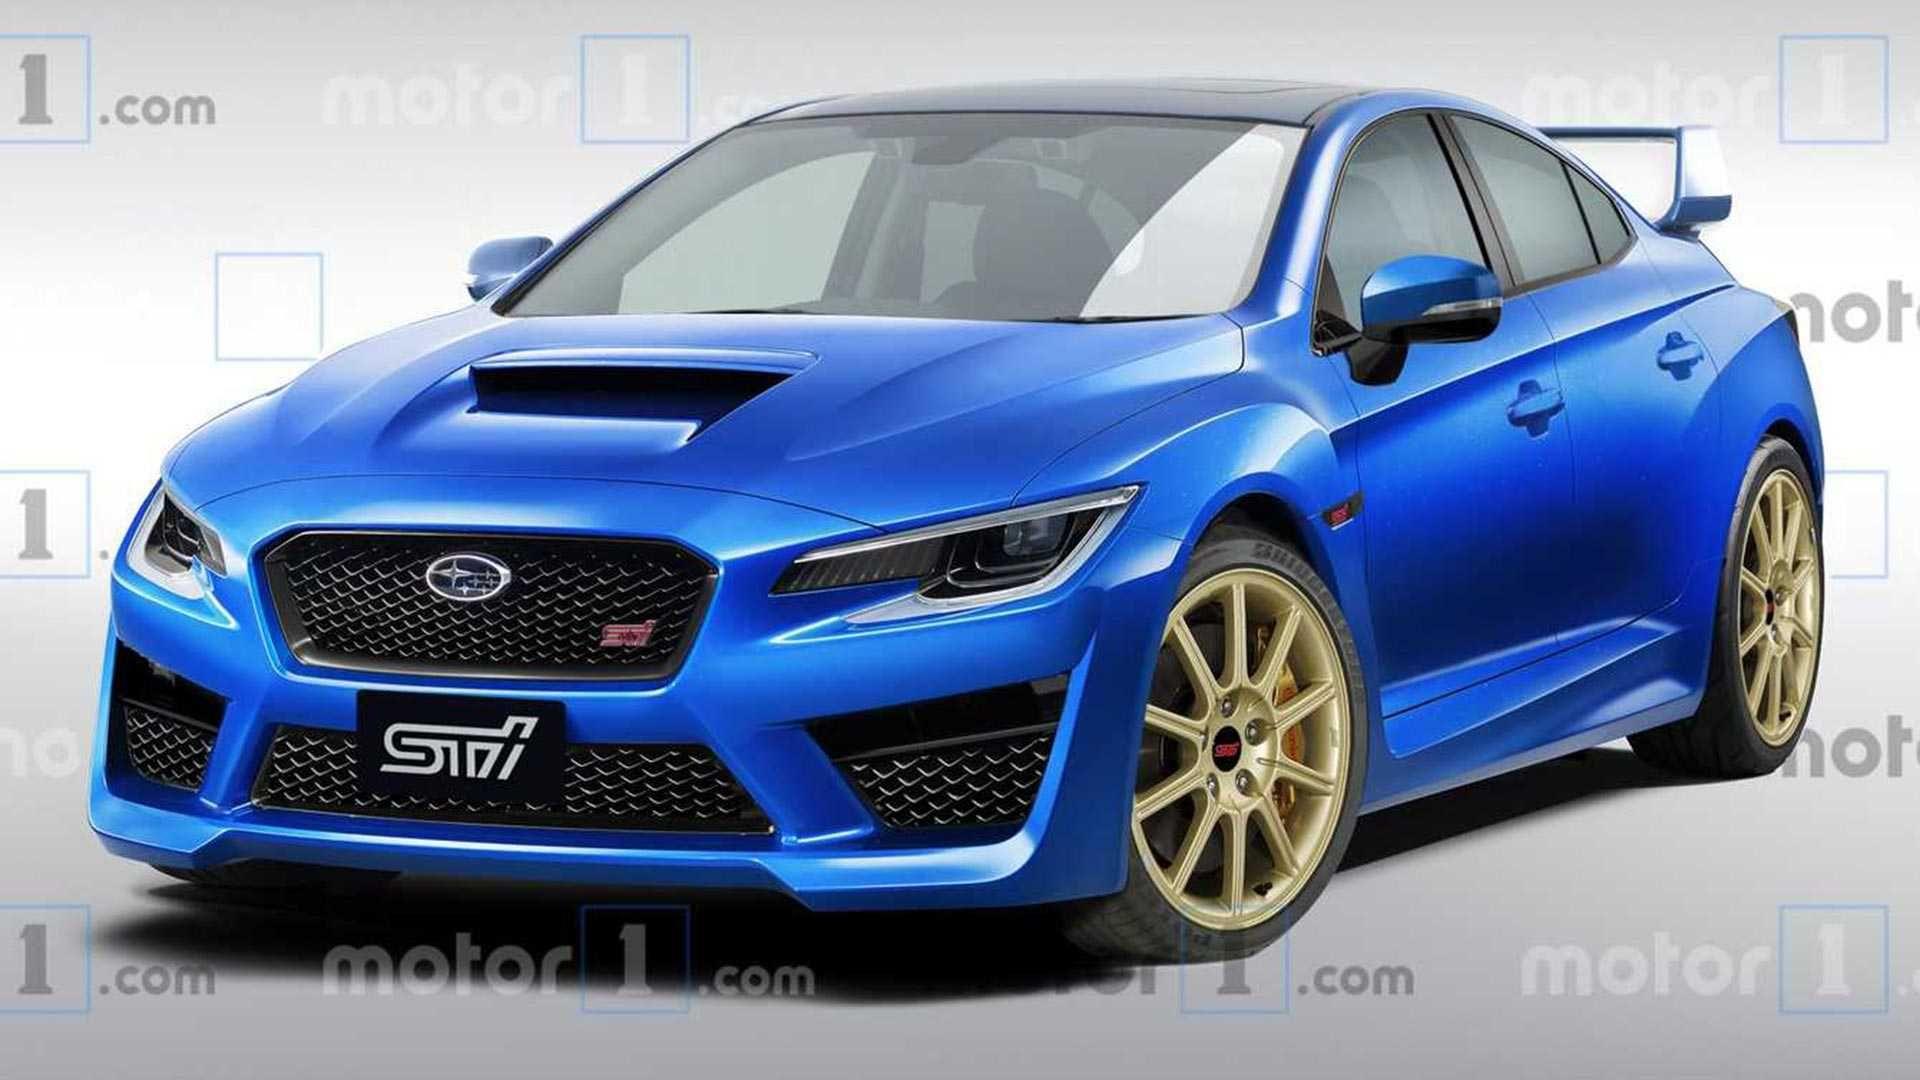 Subaru Sti 2020 Next Gen Subaru Wrx Sti Rendering Could This Be The 2020 Sti 2020 Sub Subaru Rally Subaru Wrx Sti Hatchback Sti Hatchback